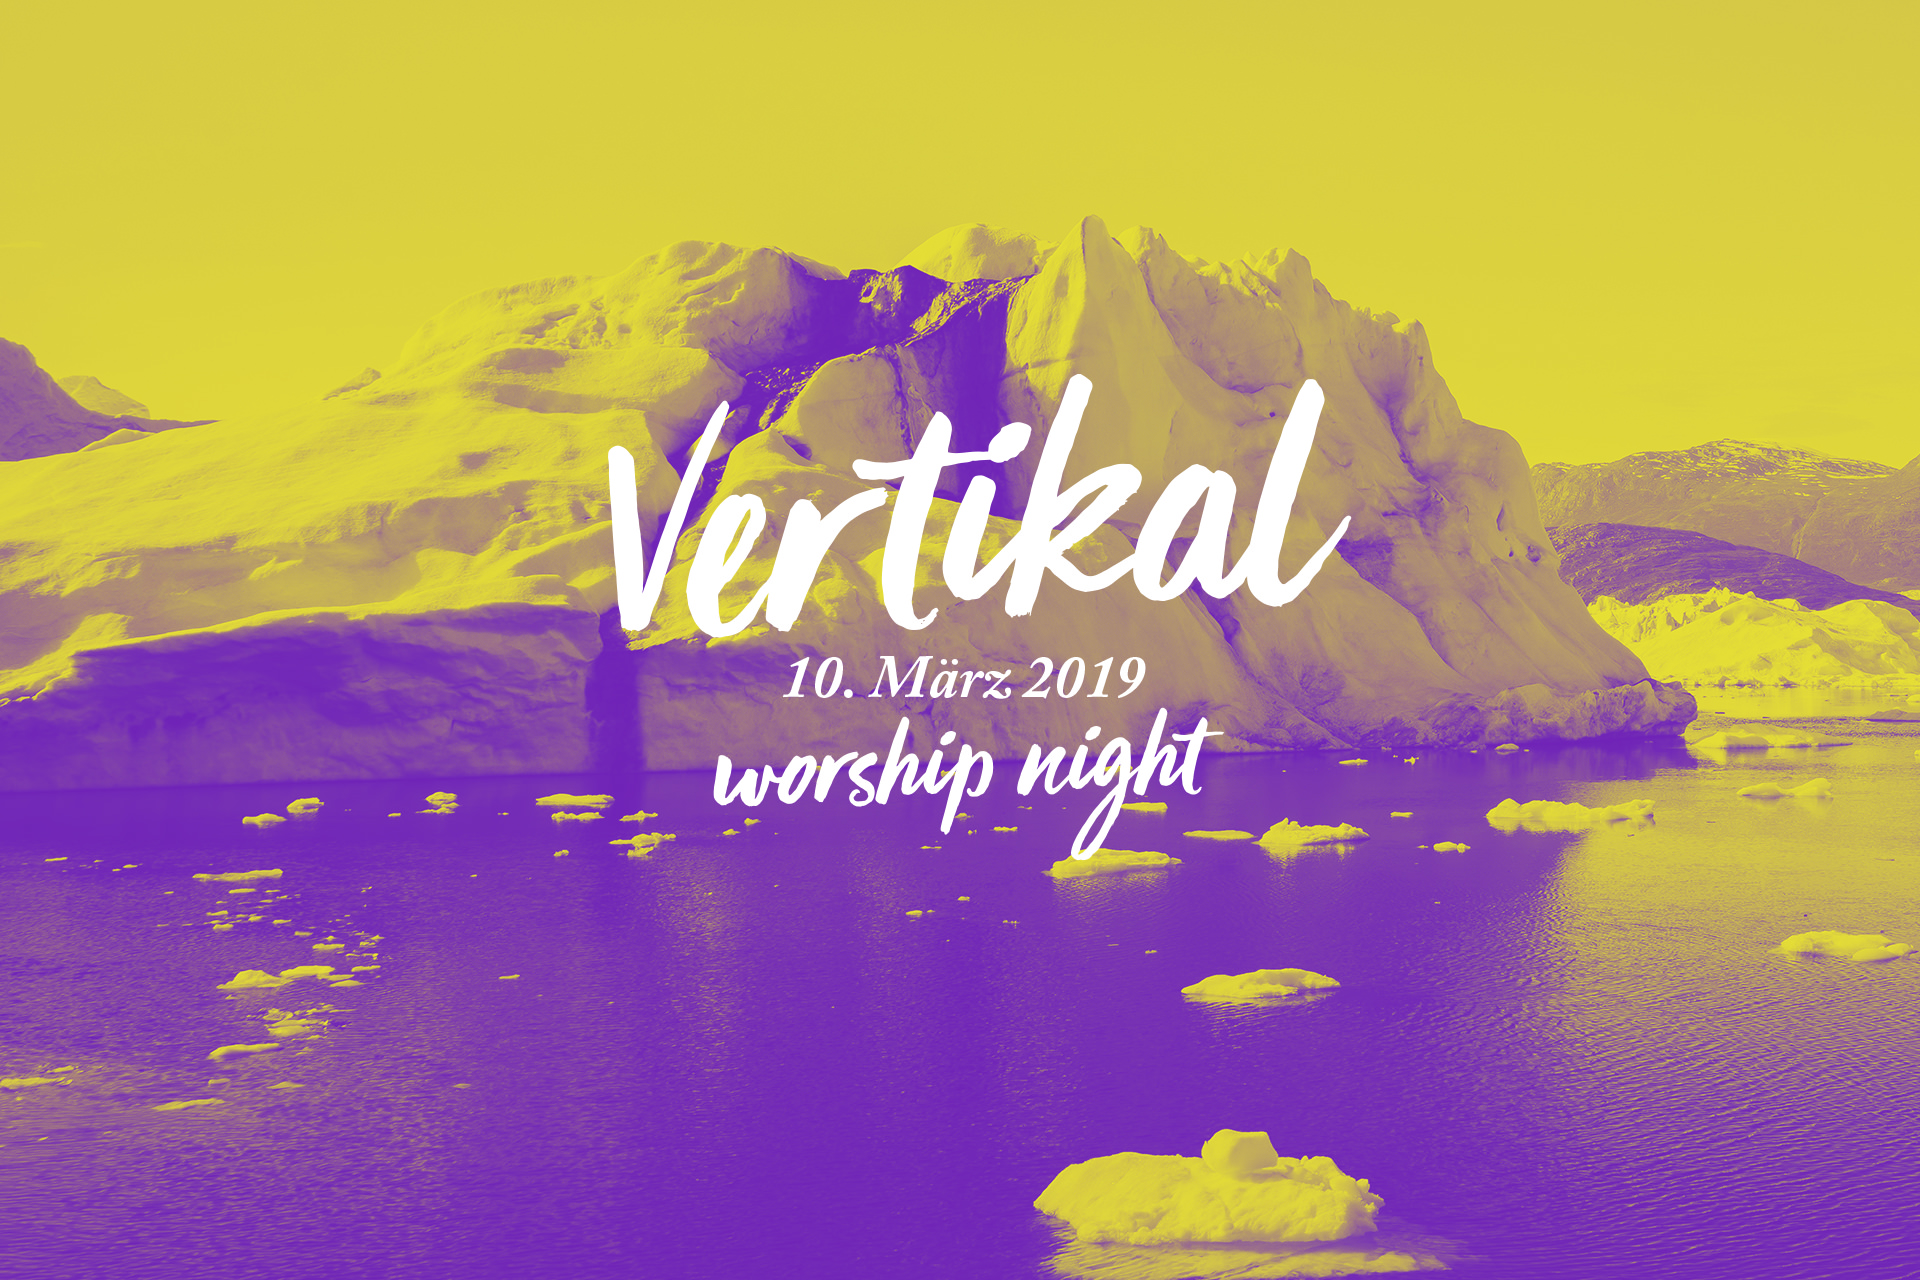 Vertikal Worship Night Bremen Mätz 2019